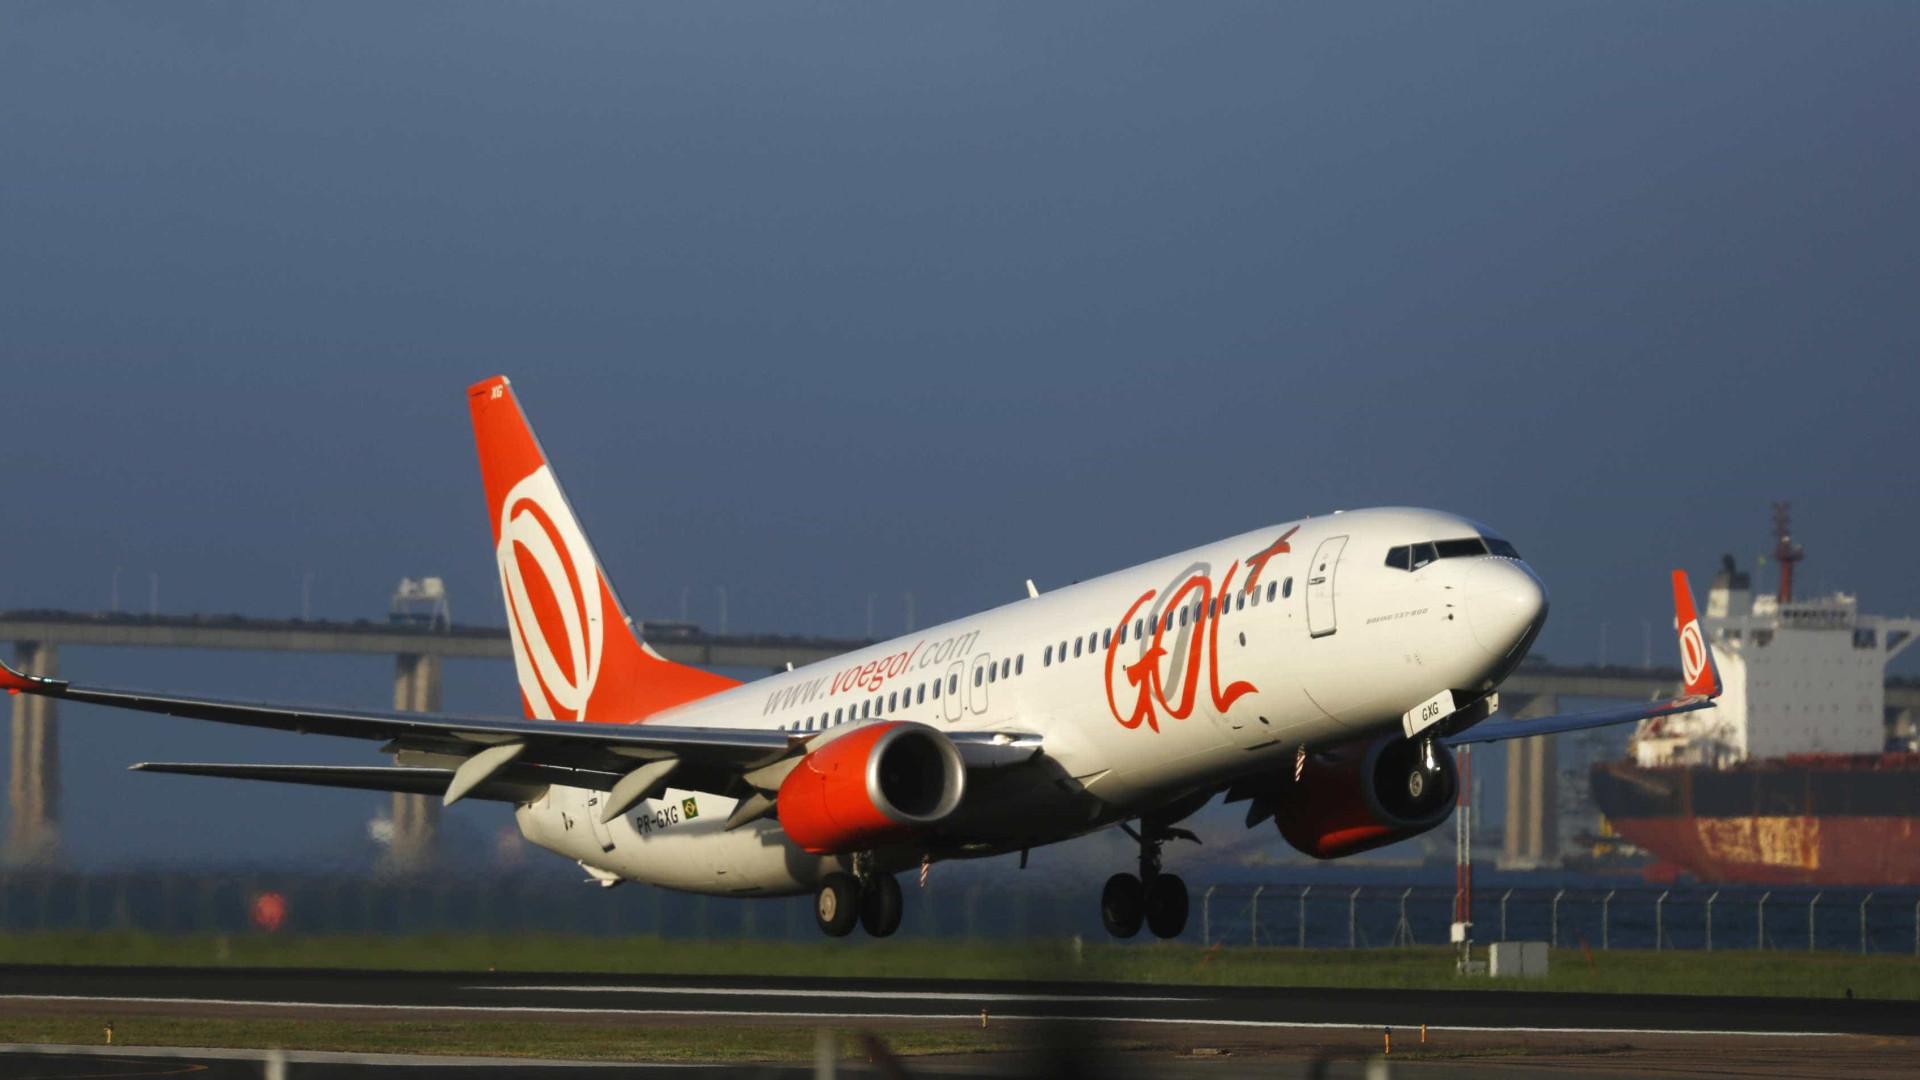 Governo volta a proibir voos comerciais de grande porte na Pampulha (MG)